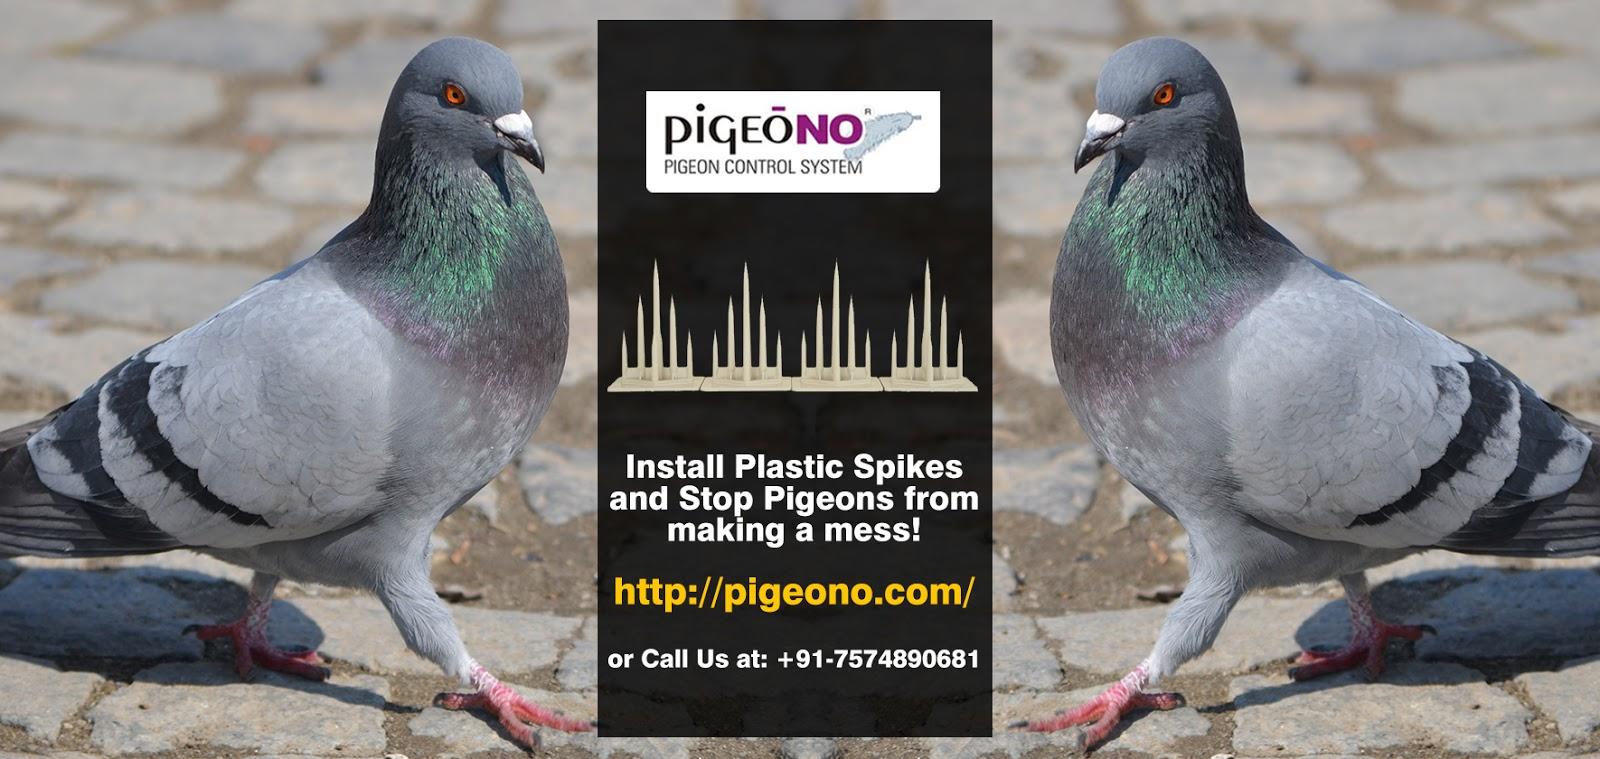 Pigeono - Bird Control Service Provider